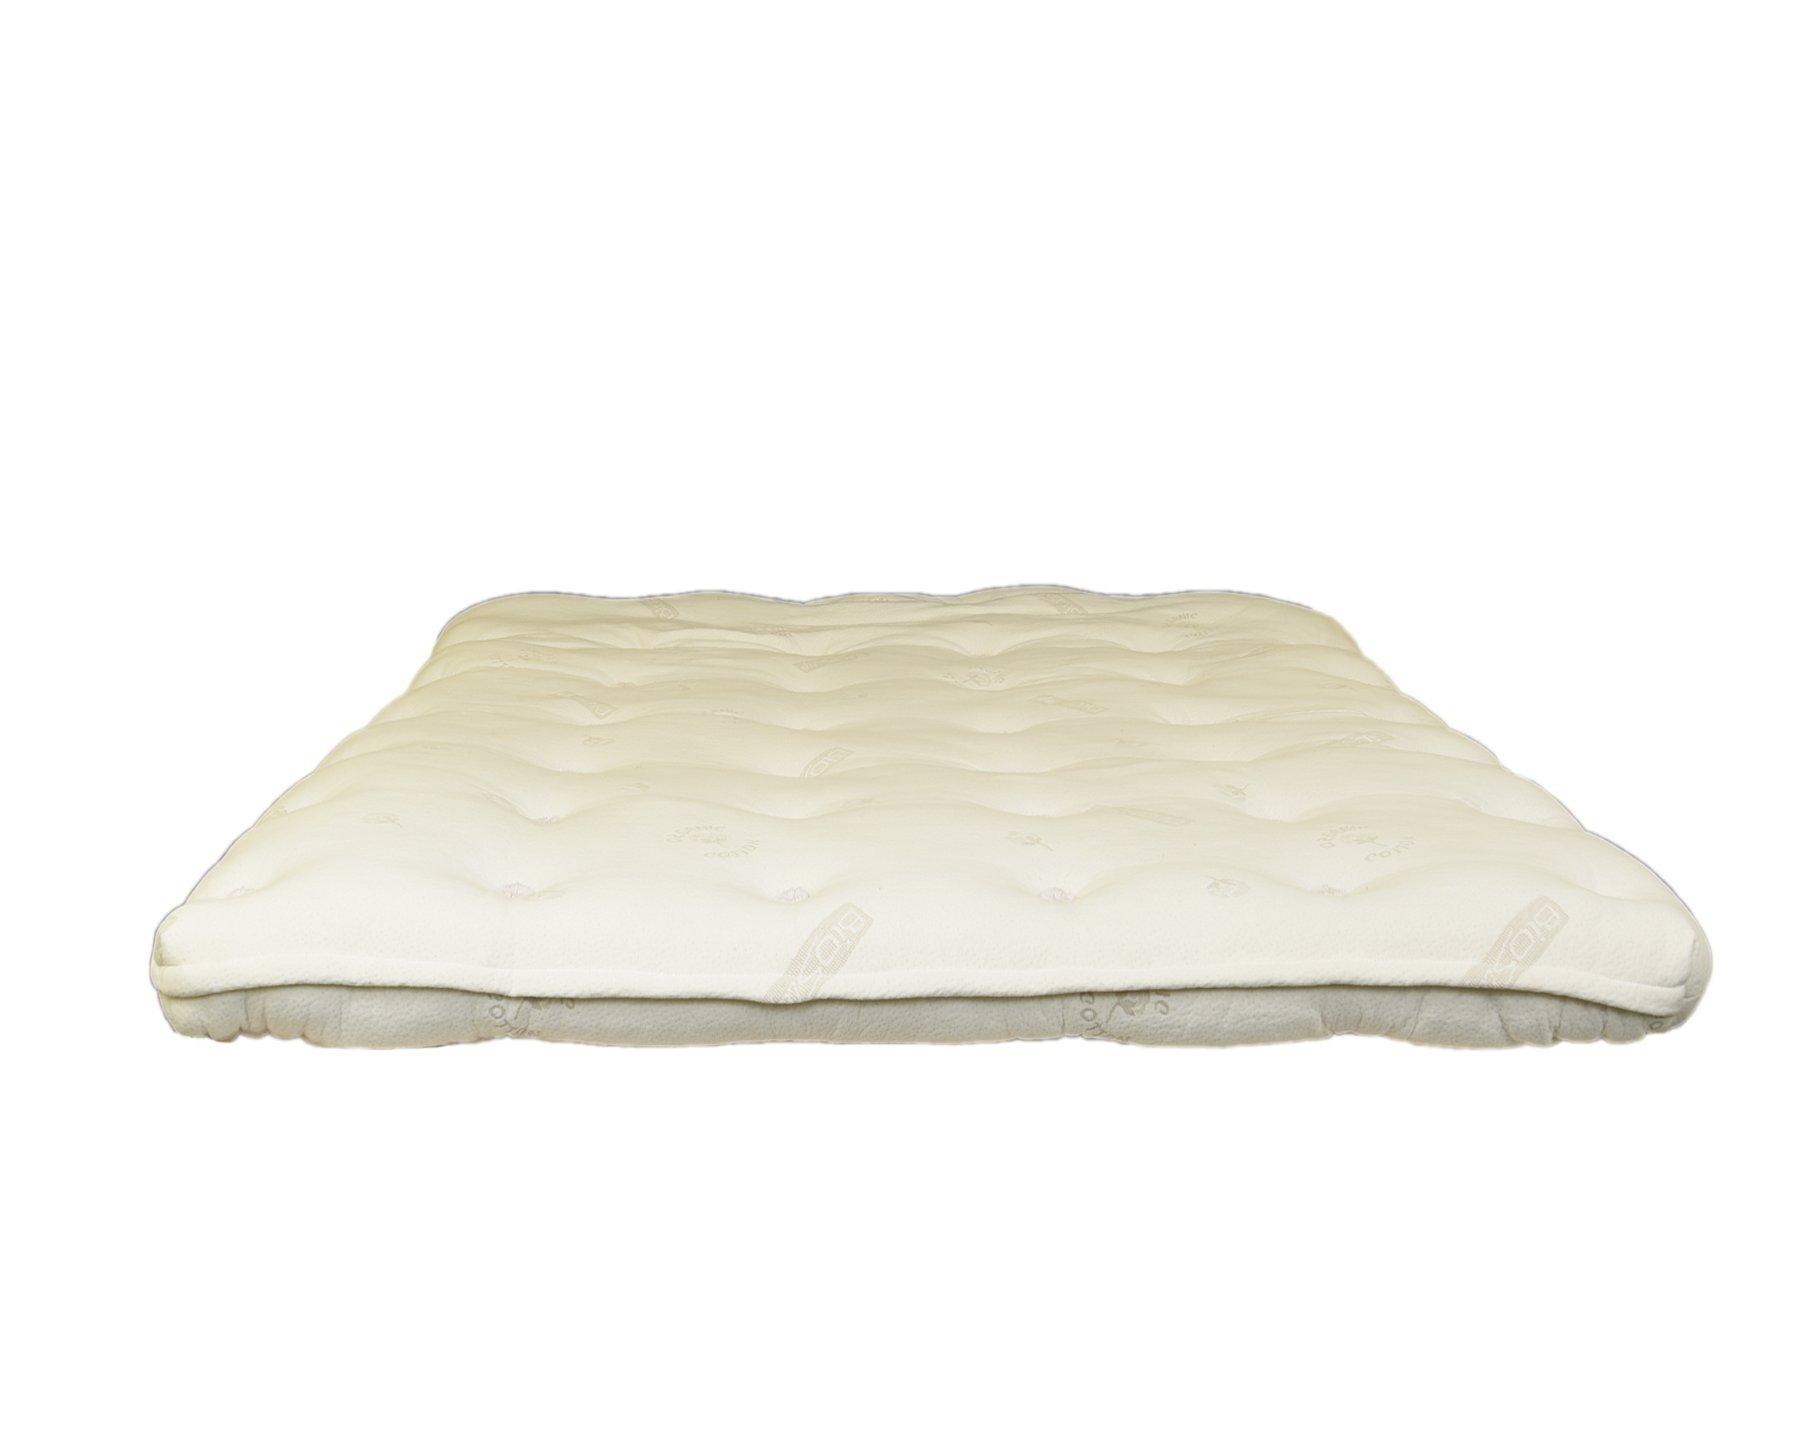 BIO SLEEP CONCEPT Heavenly 4-inch Latex and Wool Mattress Topper (King) by BIO SLEEP CONCEPT